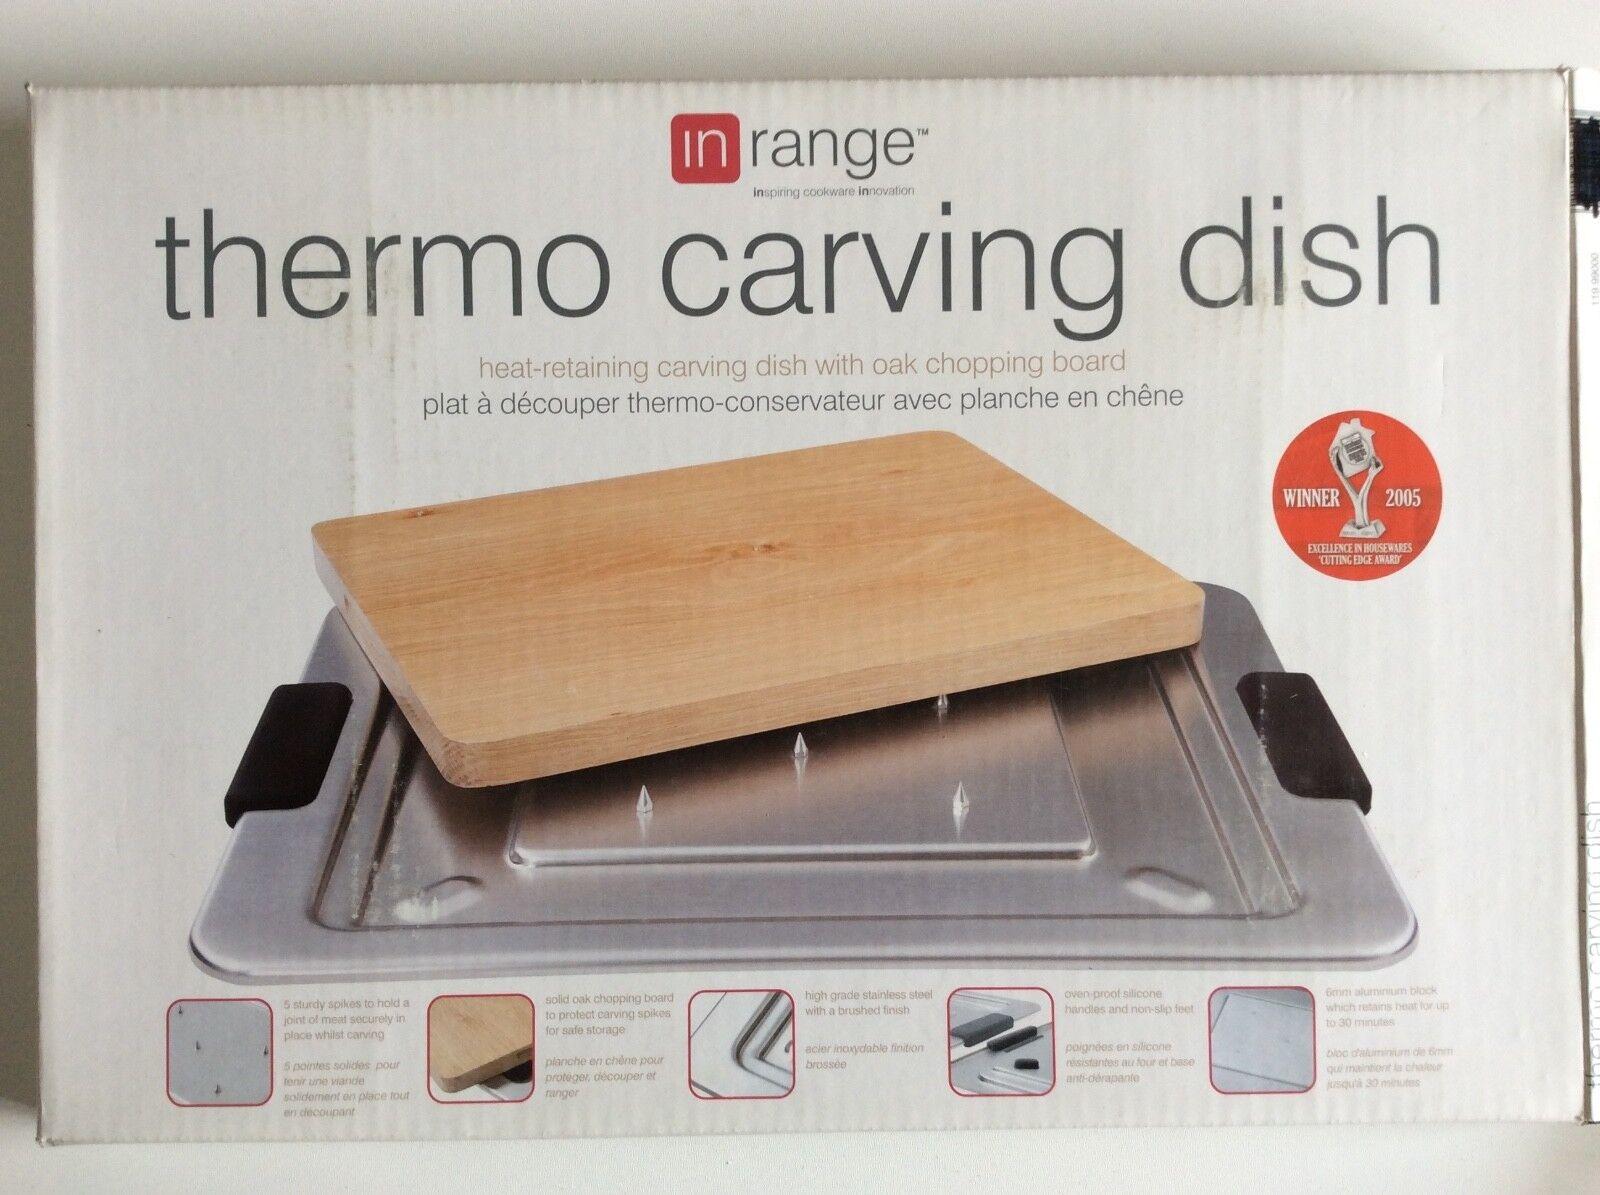 InRange Thermo Heat-retaining Carving Dish